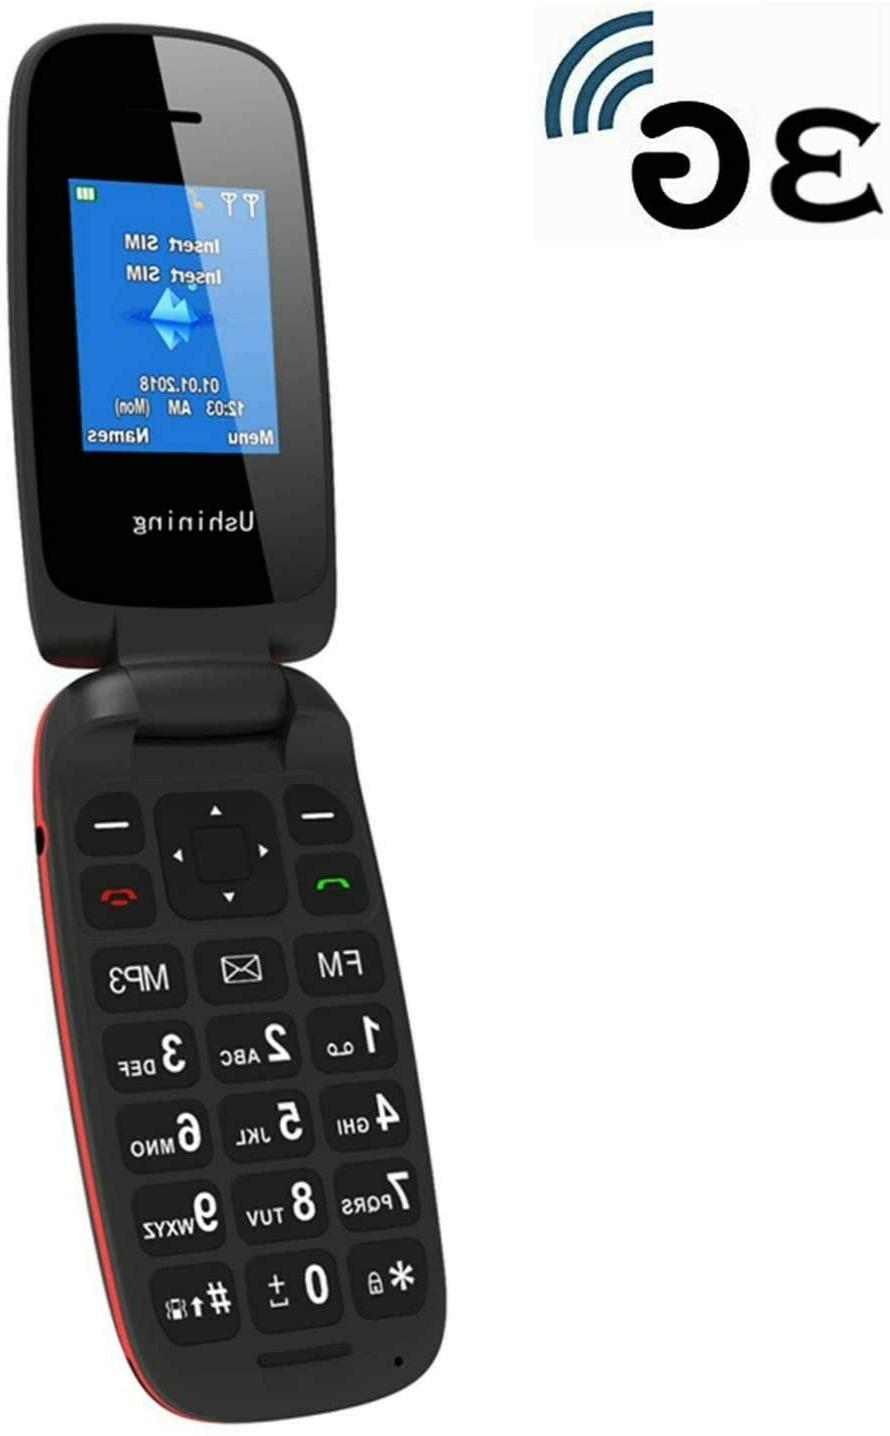 f230 3g unlocked tmobile flip phone large